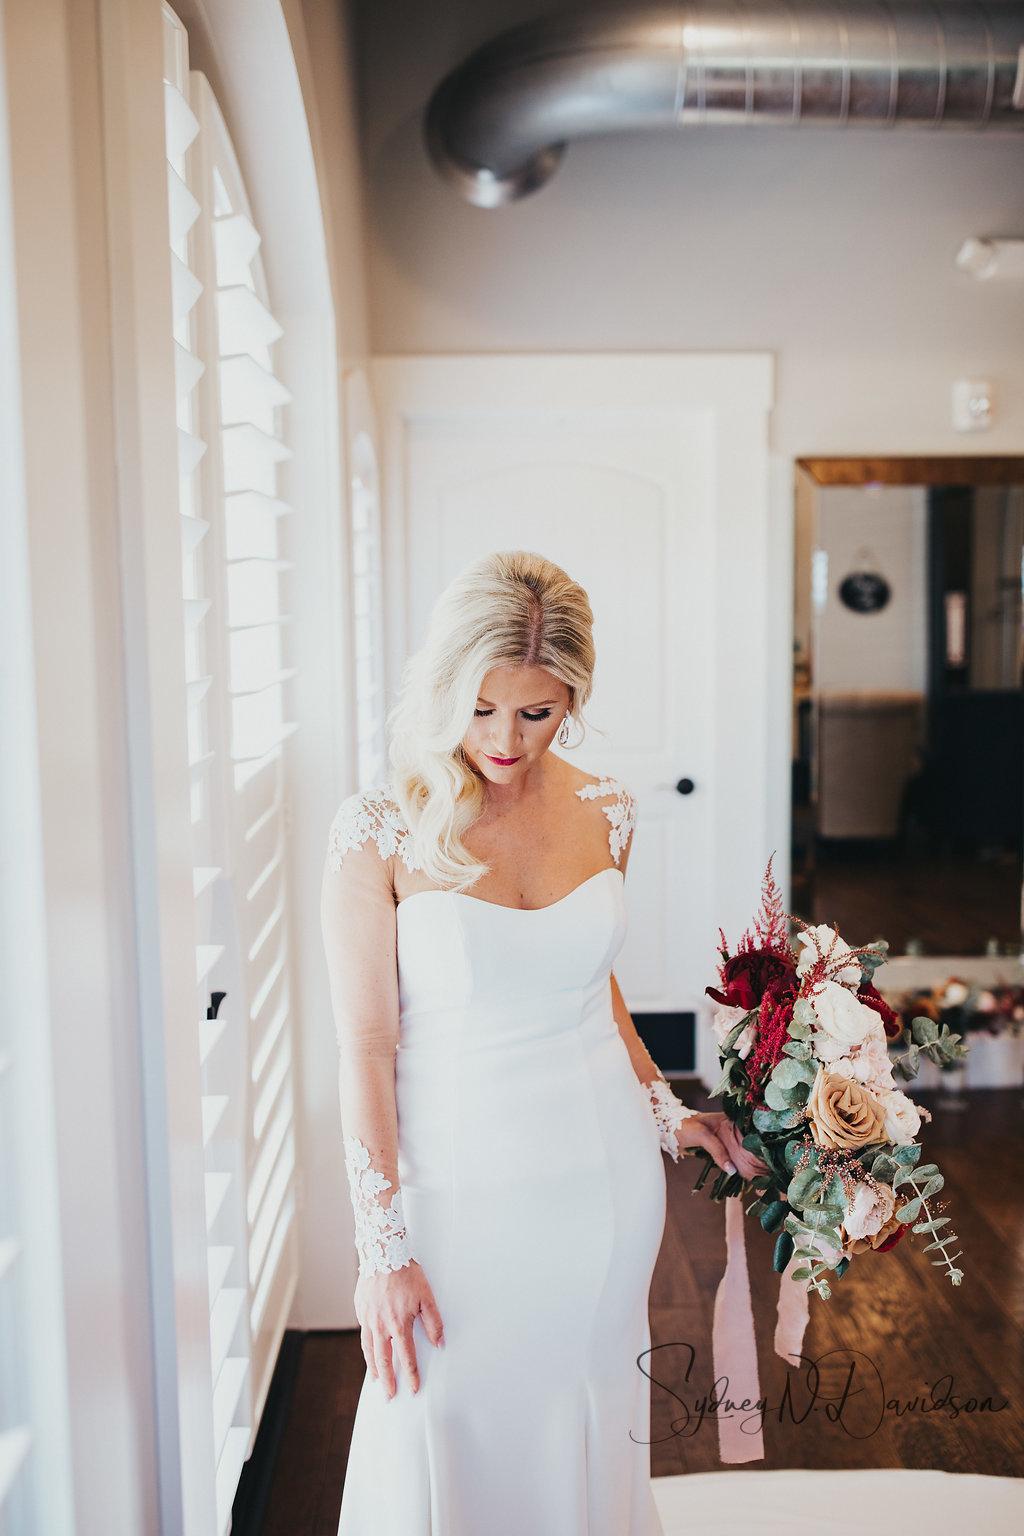 sydney-davidson-wedding-stillwater-oklahoma-wedding-session-traveling-photographer-portrait-tulsa-oklahoma-1789.jpg